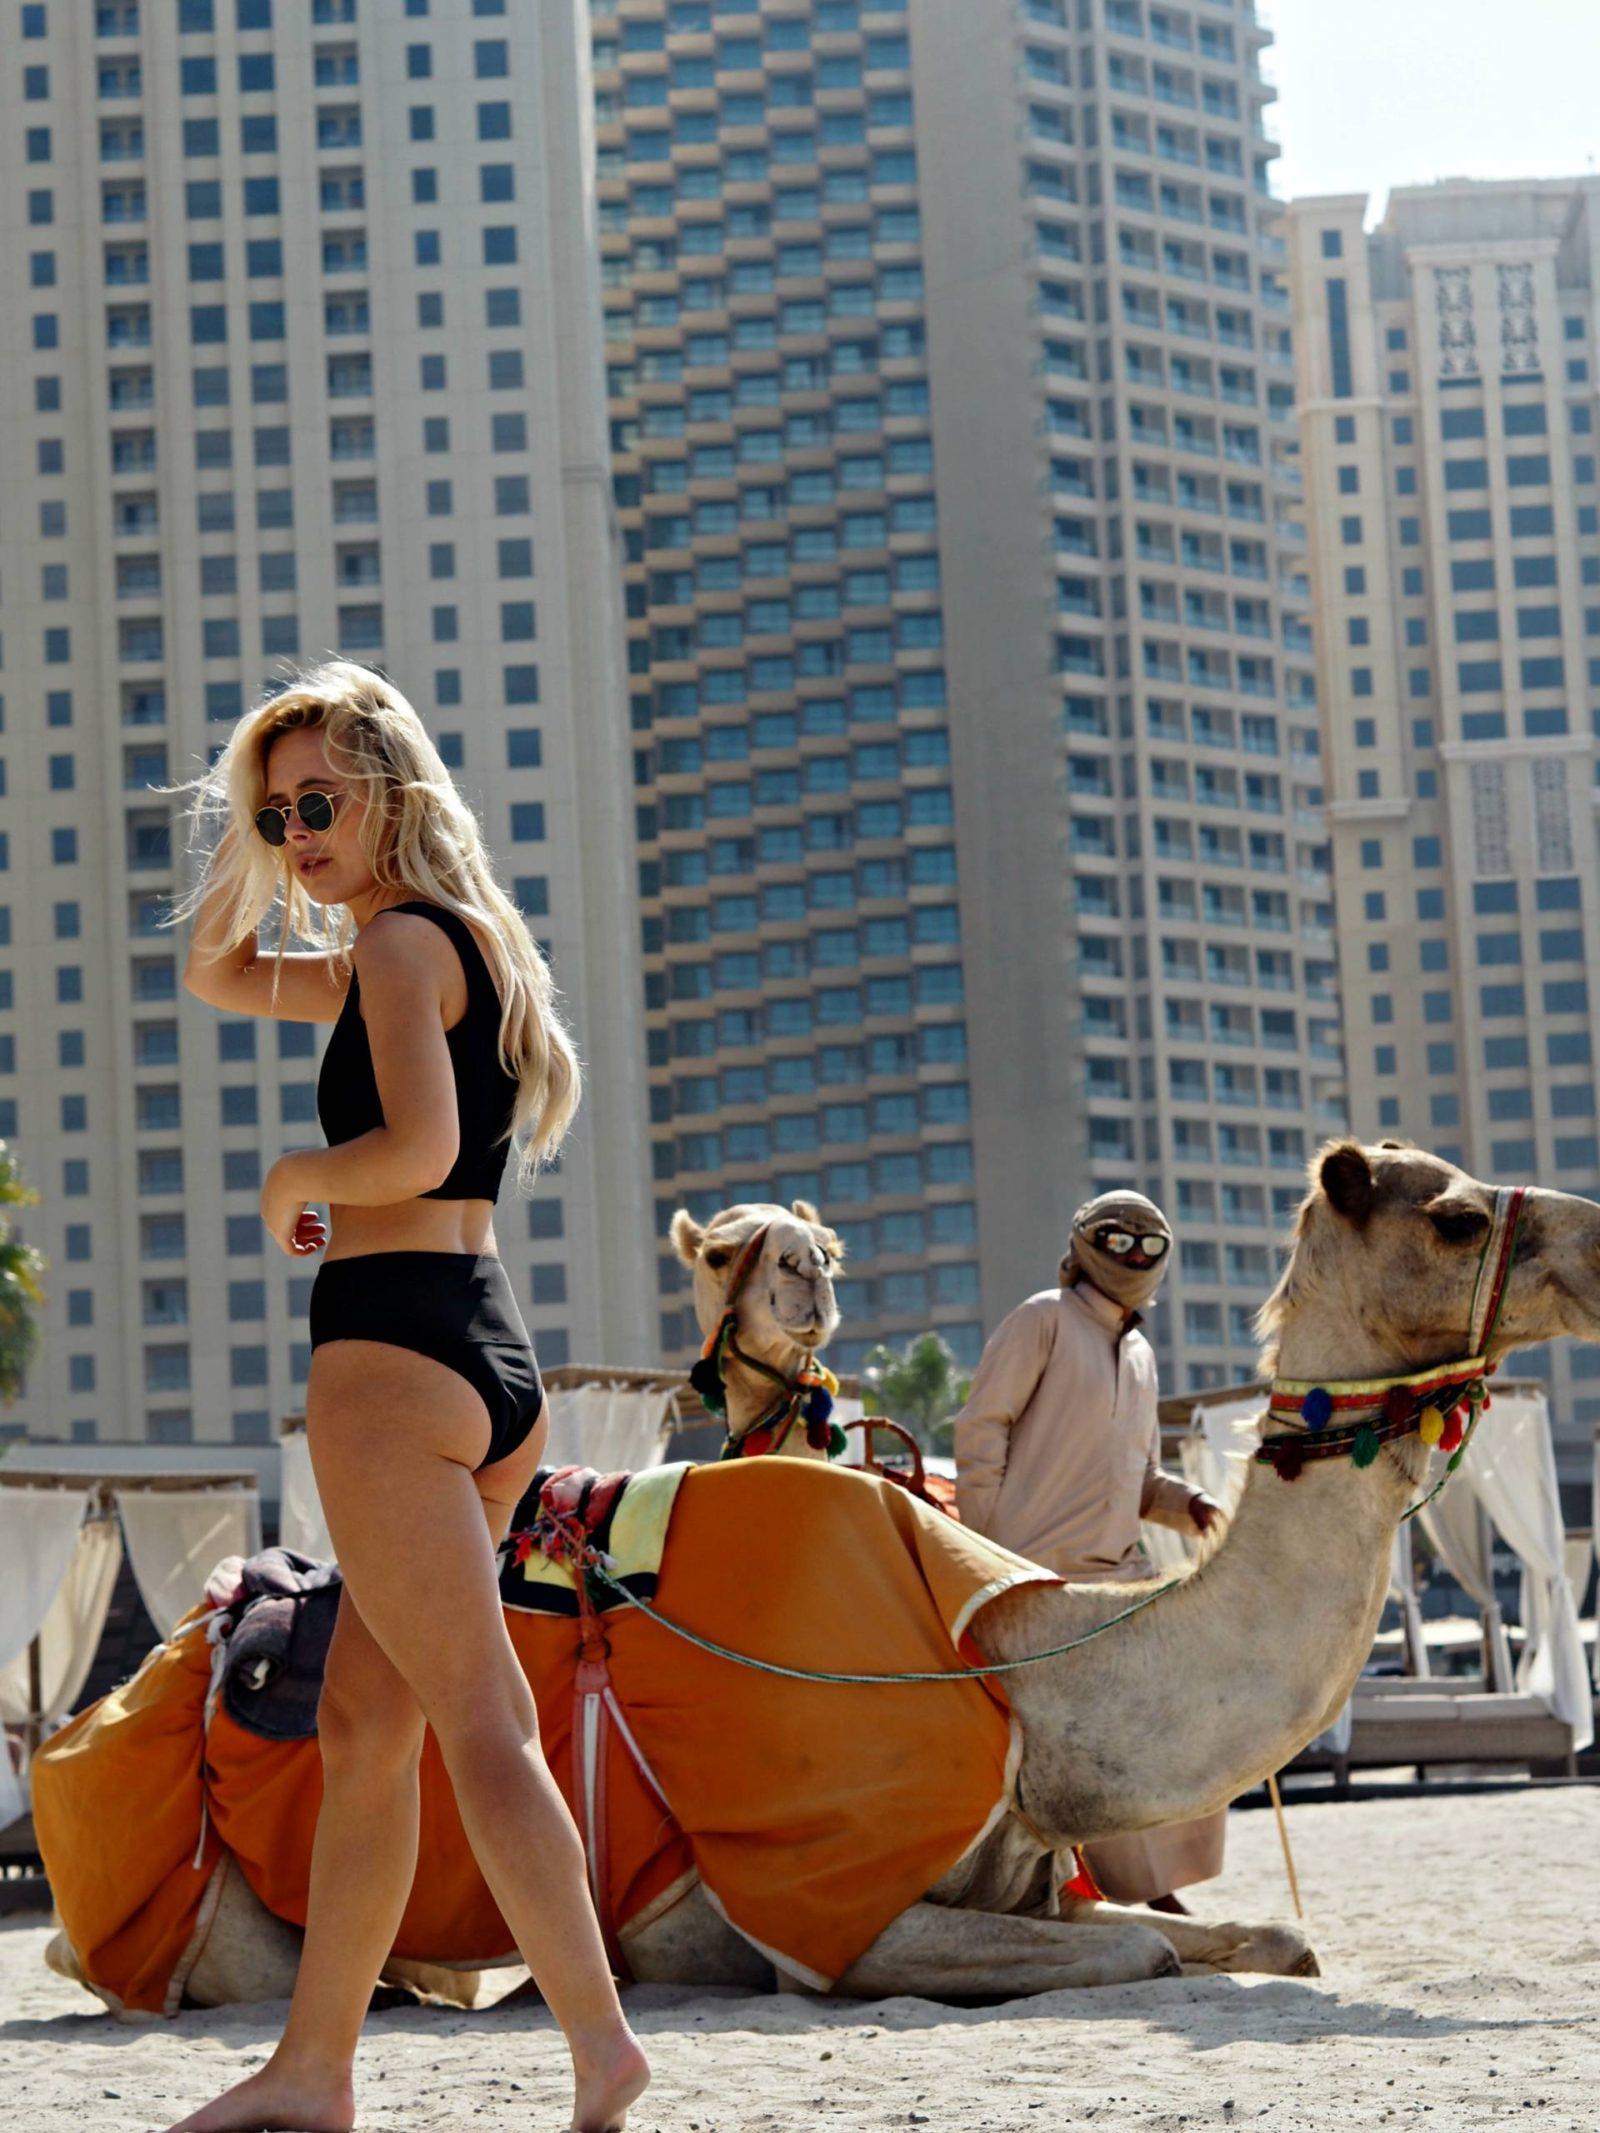 Dubai With Radisson Blu I Am Georg White 1 Gratis Sexy V Neck Lace Bra